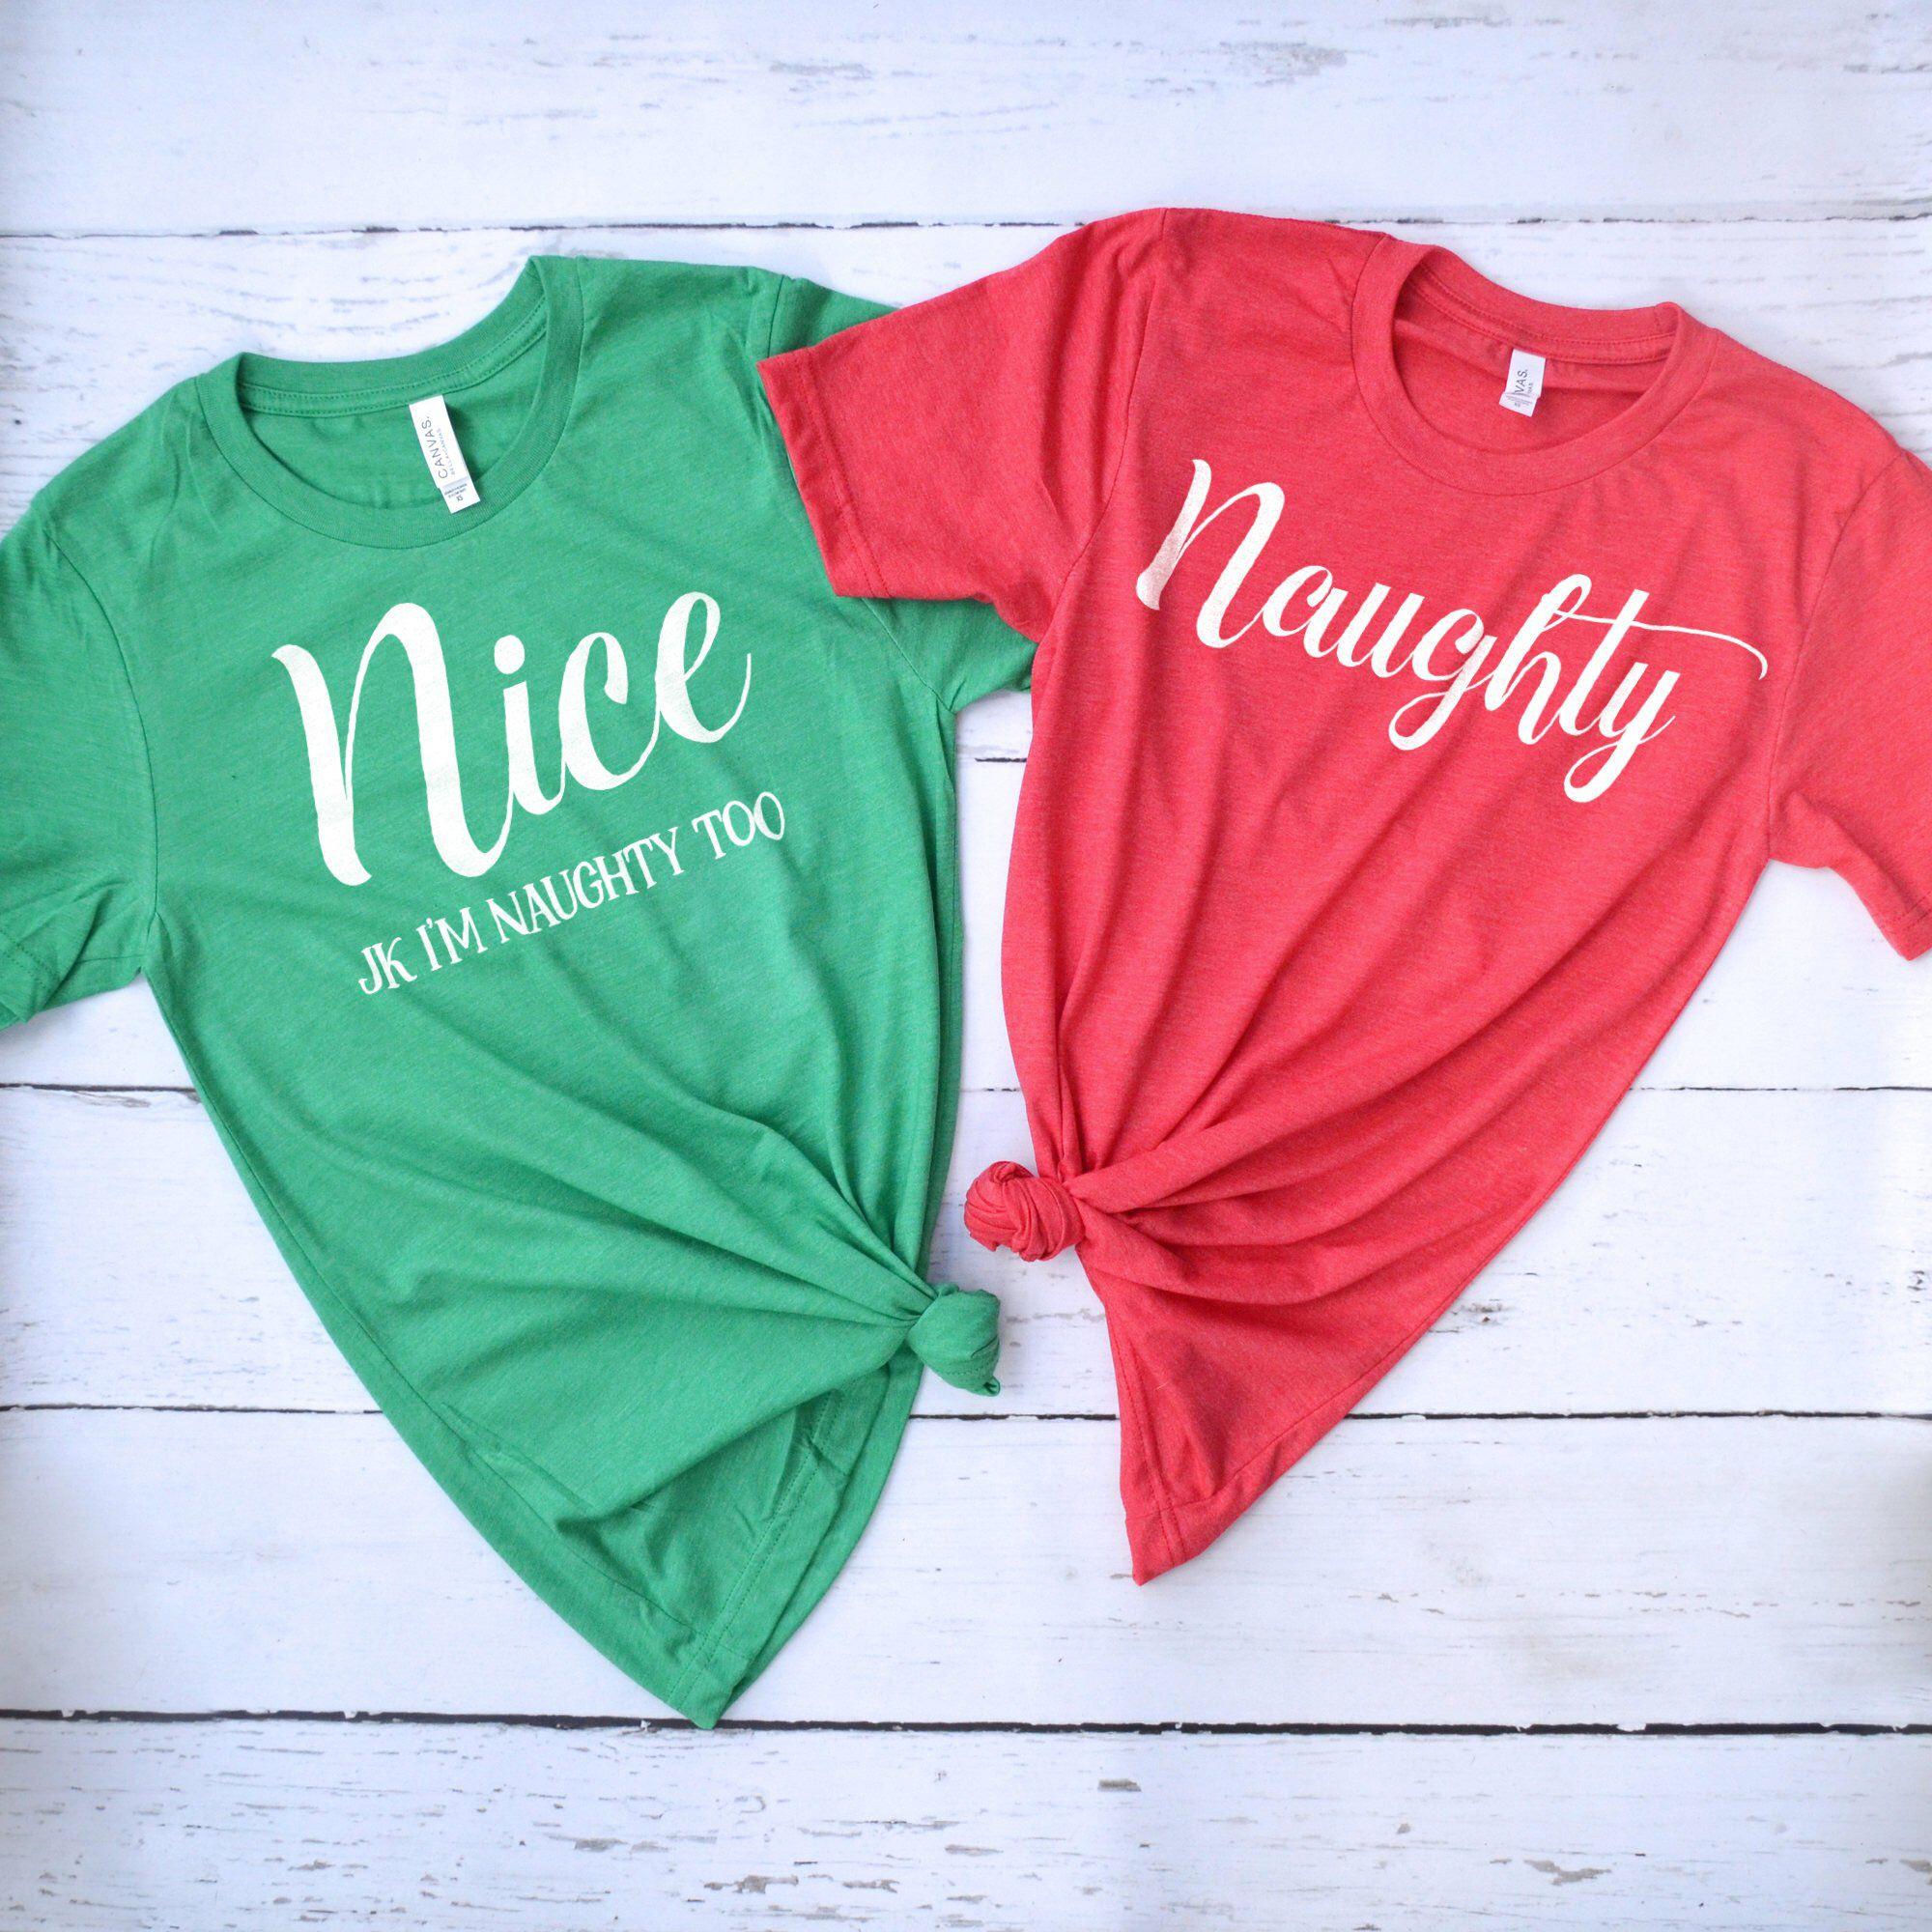 Santa Claus Naughty List Didnt Try Christmas Shirt Funny Cool Pullover Sweatshir